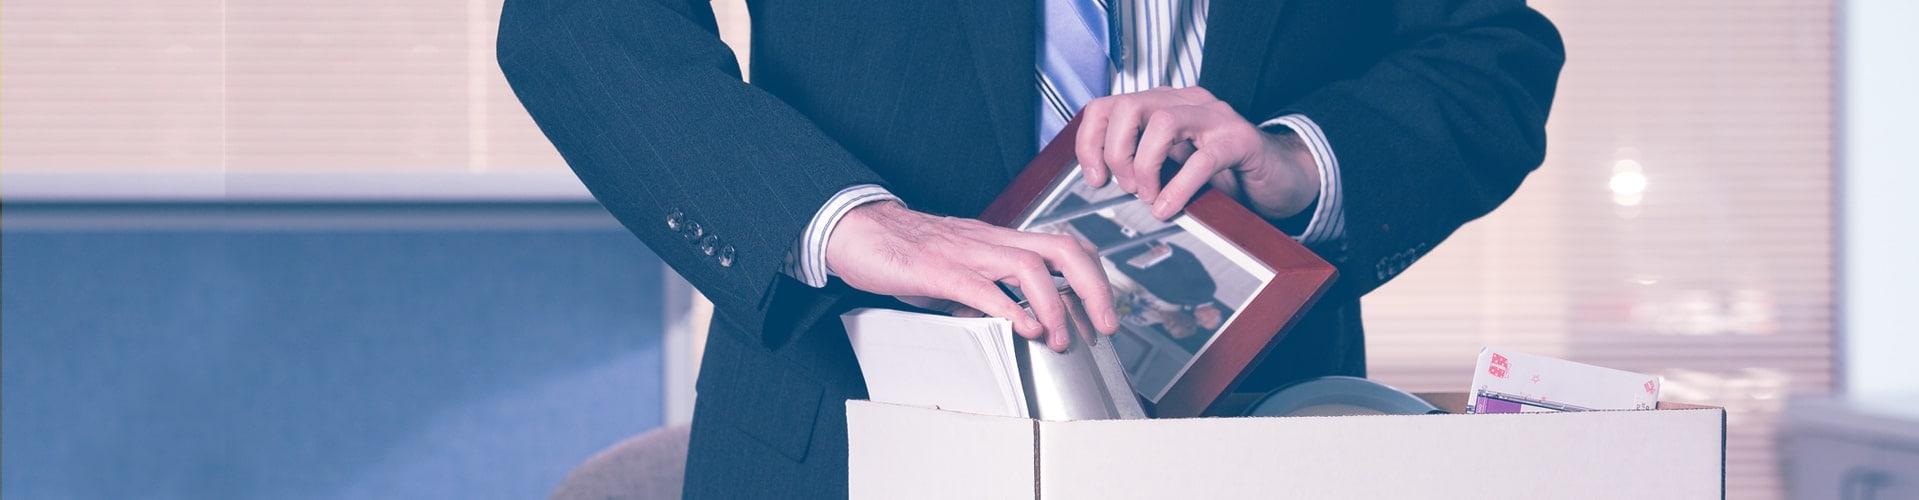 Unfair Dismissal Claims in UK